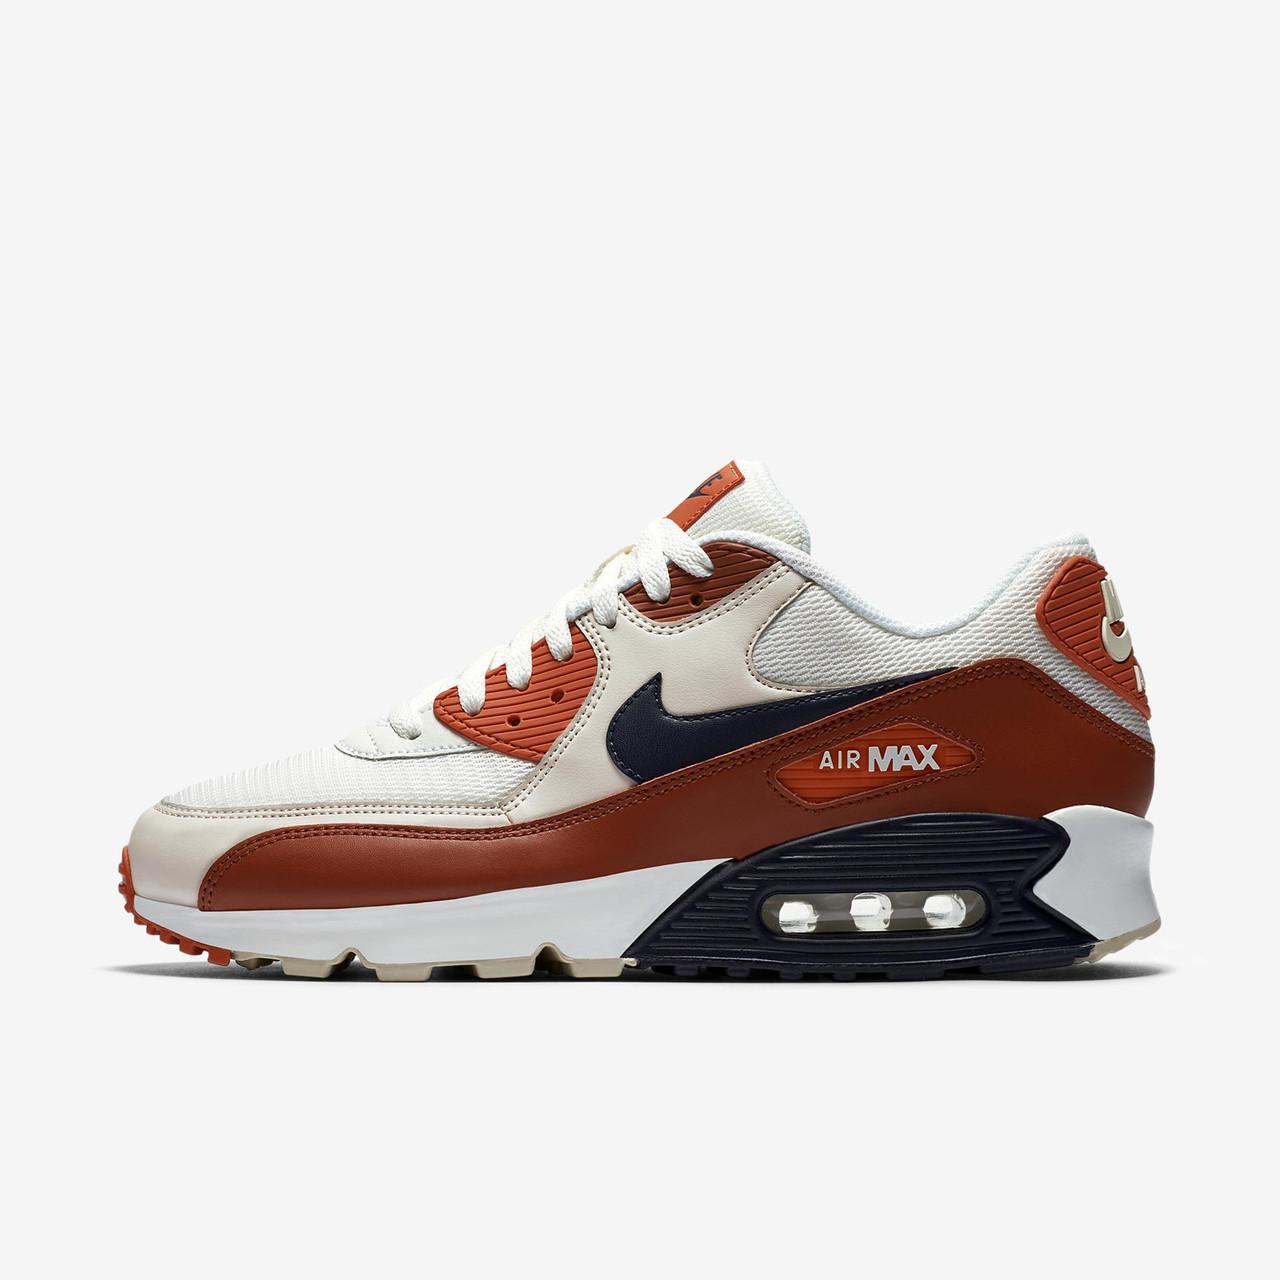 52b216b8 Оригинальные кроссовки Nike Air Max 90 Essential - Sport-Sneakers - Оригинальные  кроссовки - Sneakerhead